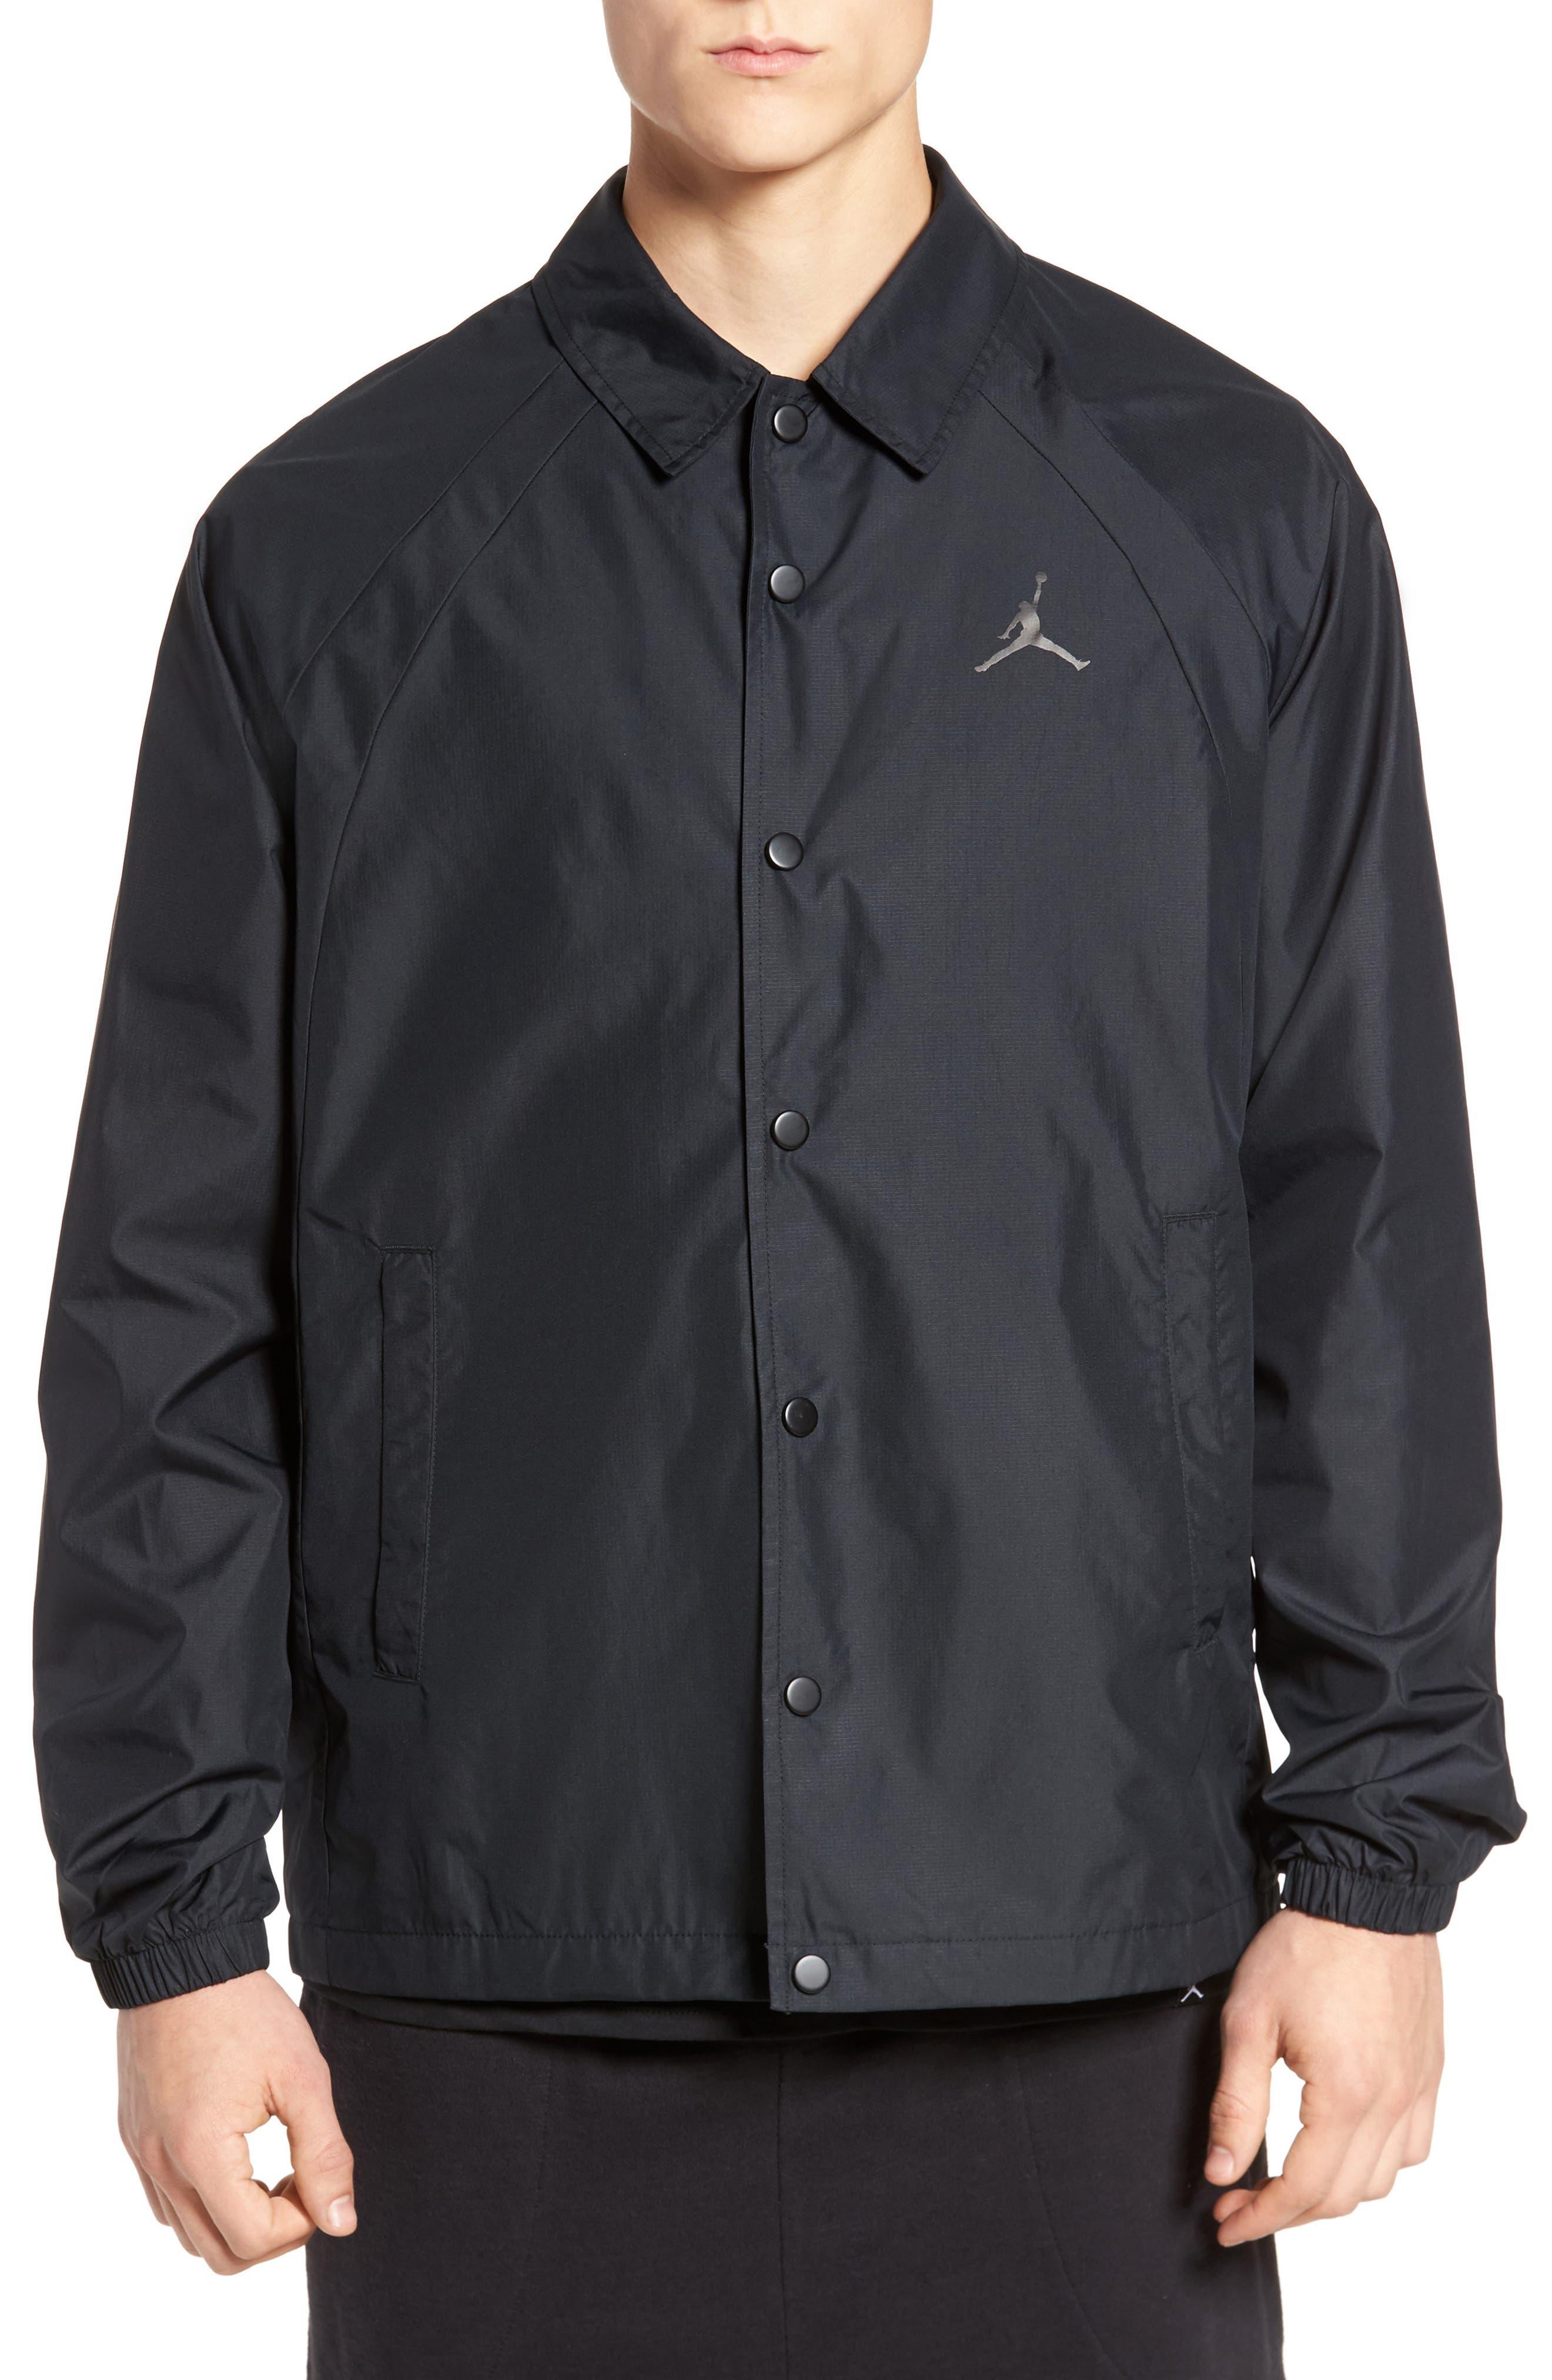 Nike Wings Coach's Jacket,                             Main thumbnail 1, color,                             010